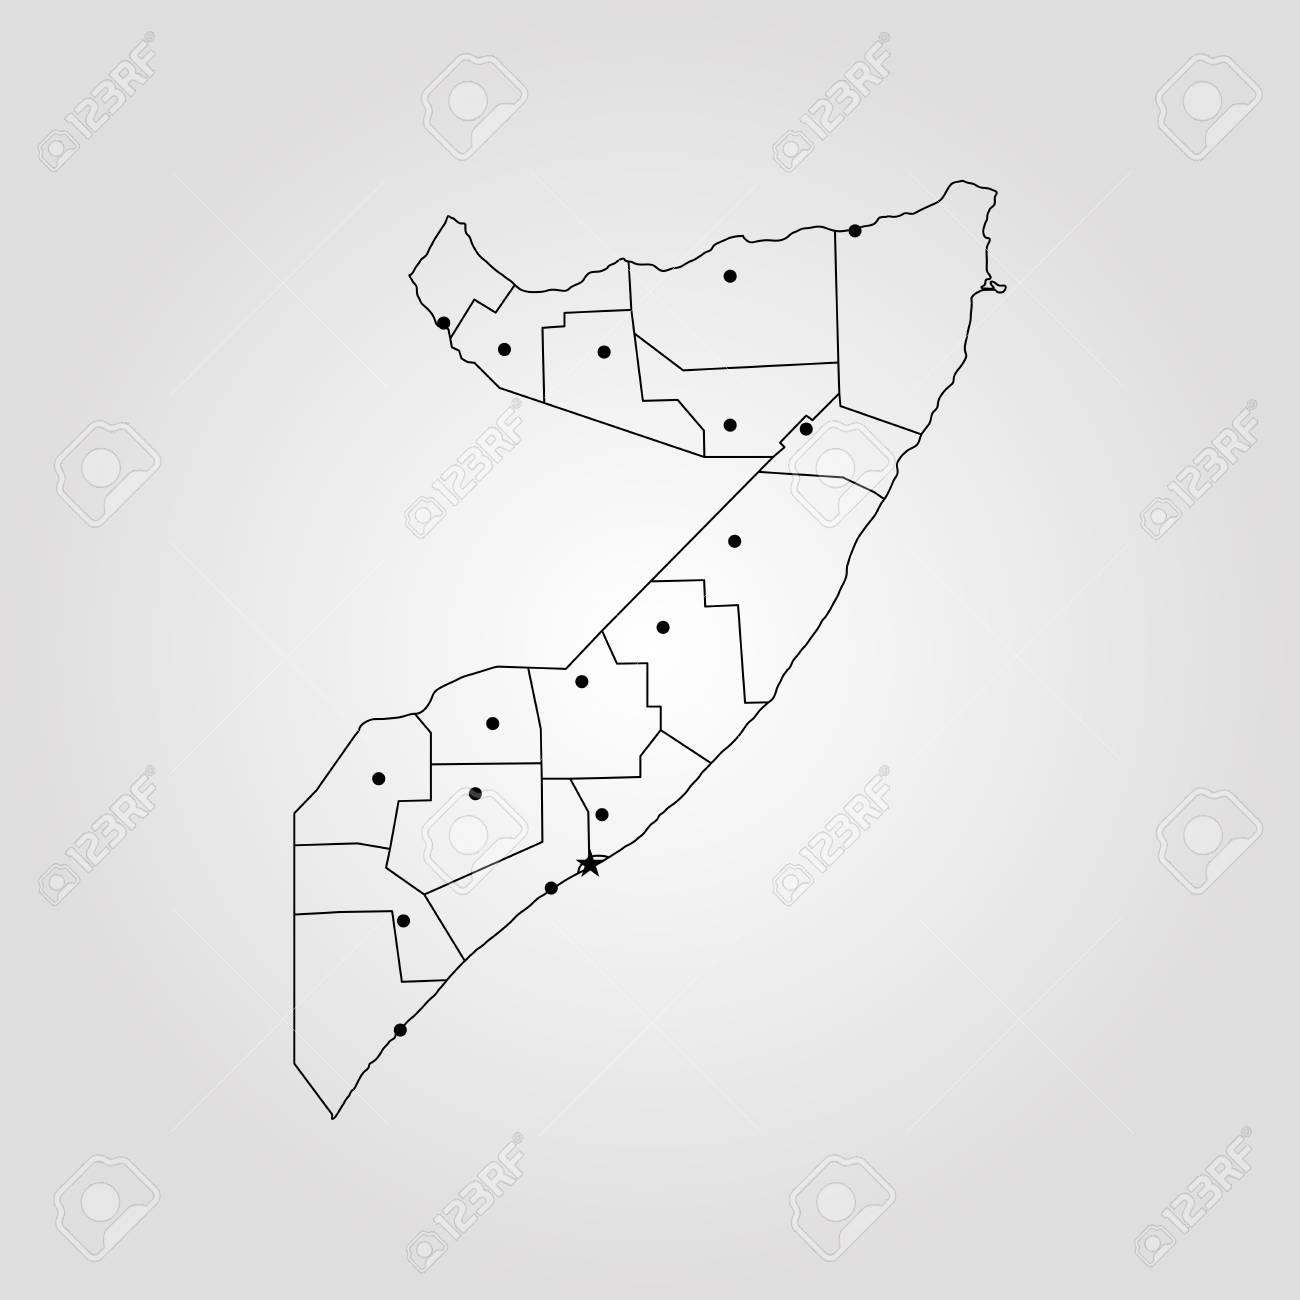 World Map Somolia.Map Of Somalia Vector Illustration World Map Royalty Free Cliparts